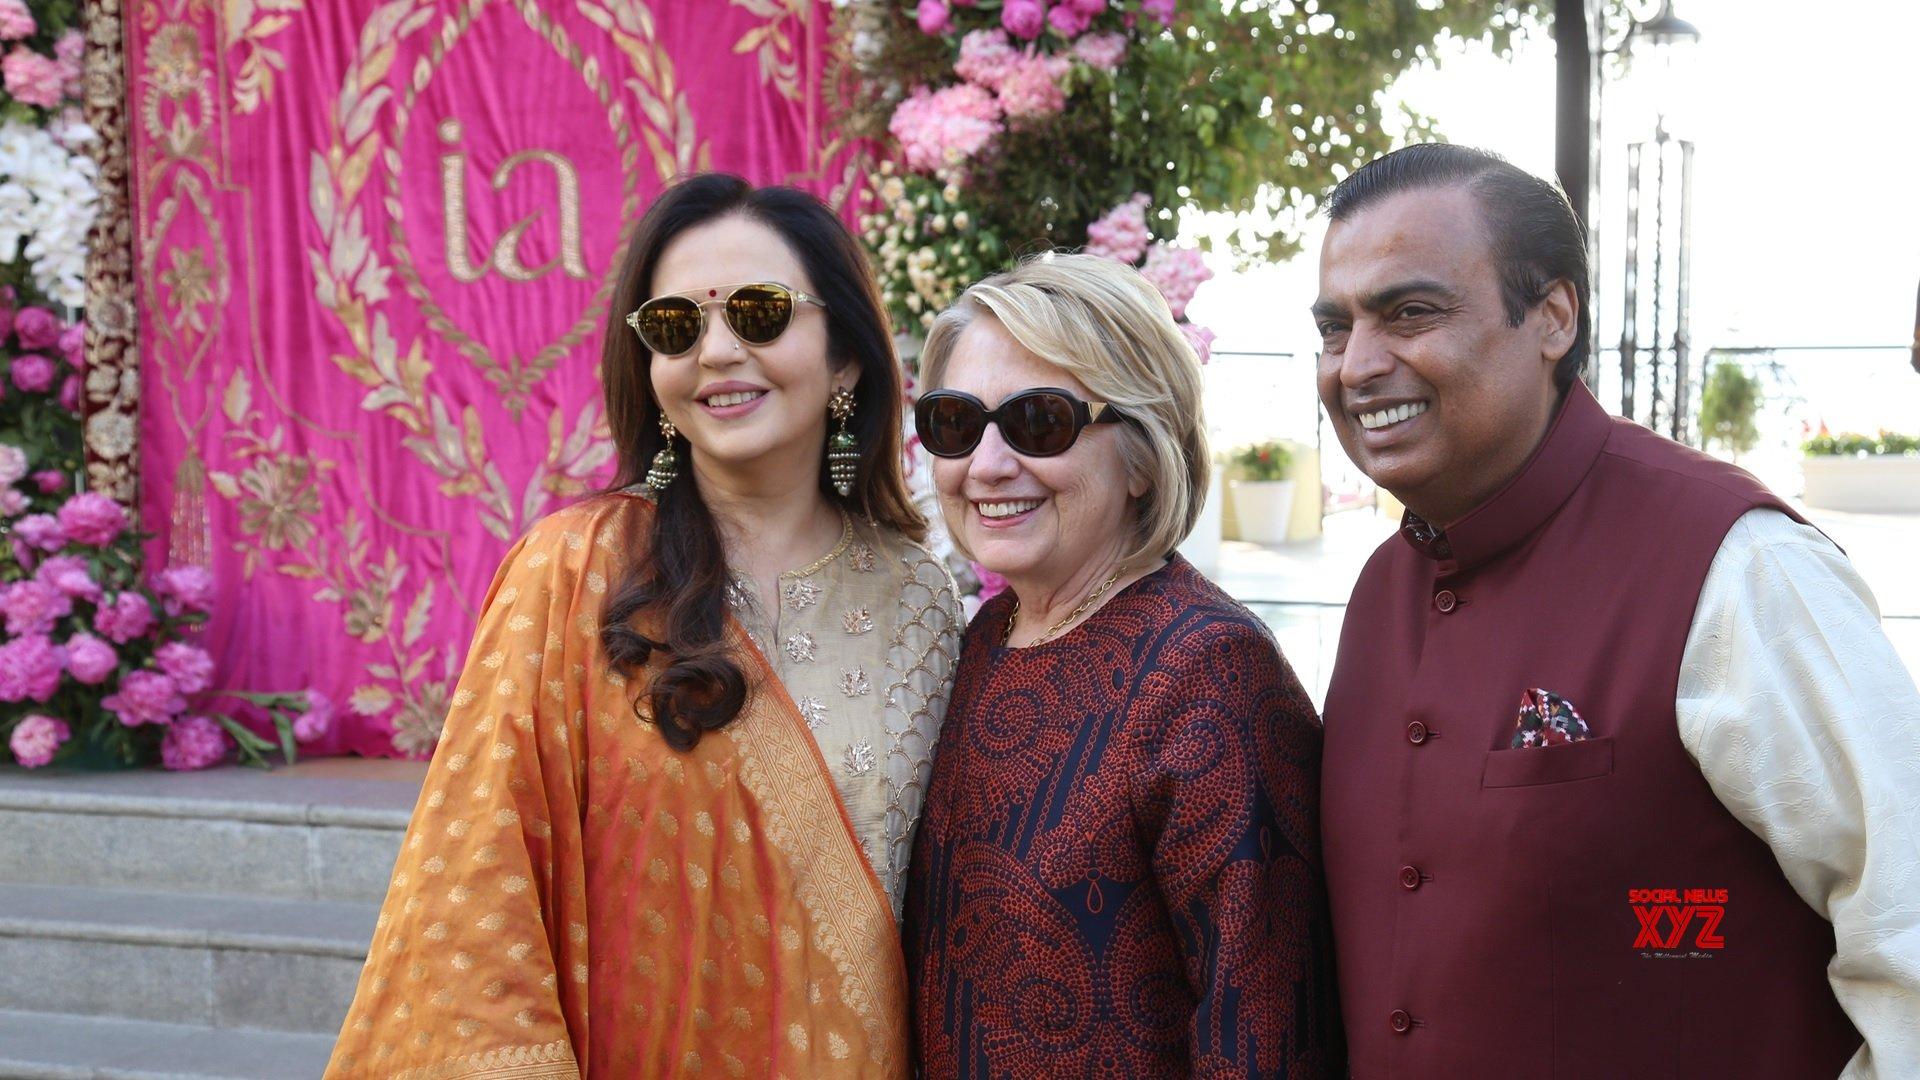 Hillary Clinton, Bollywood stars in Udaipur for Isha Ambani's wedding celebrations